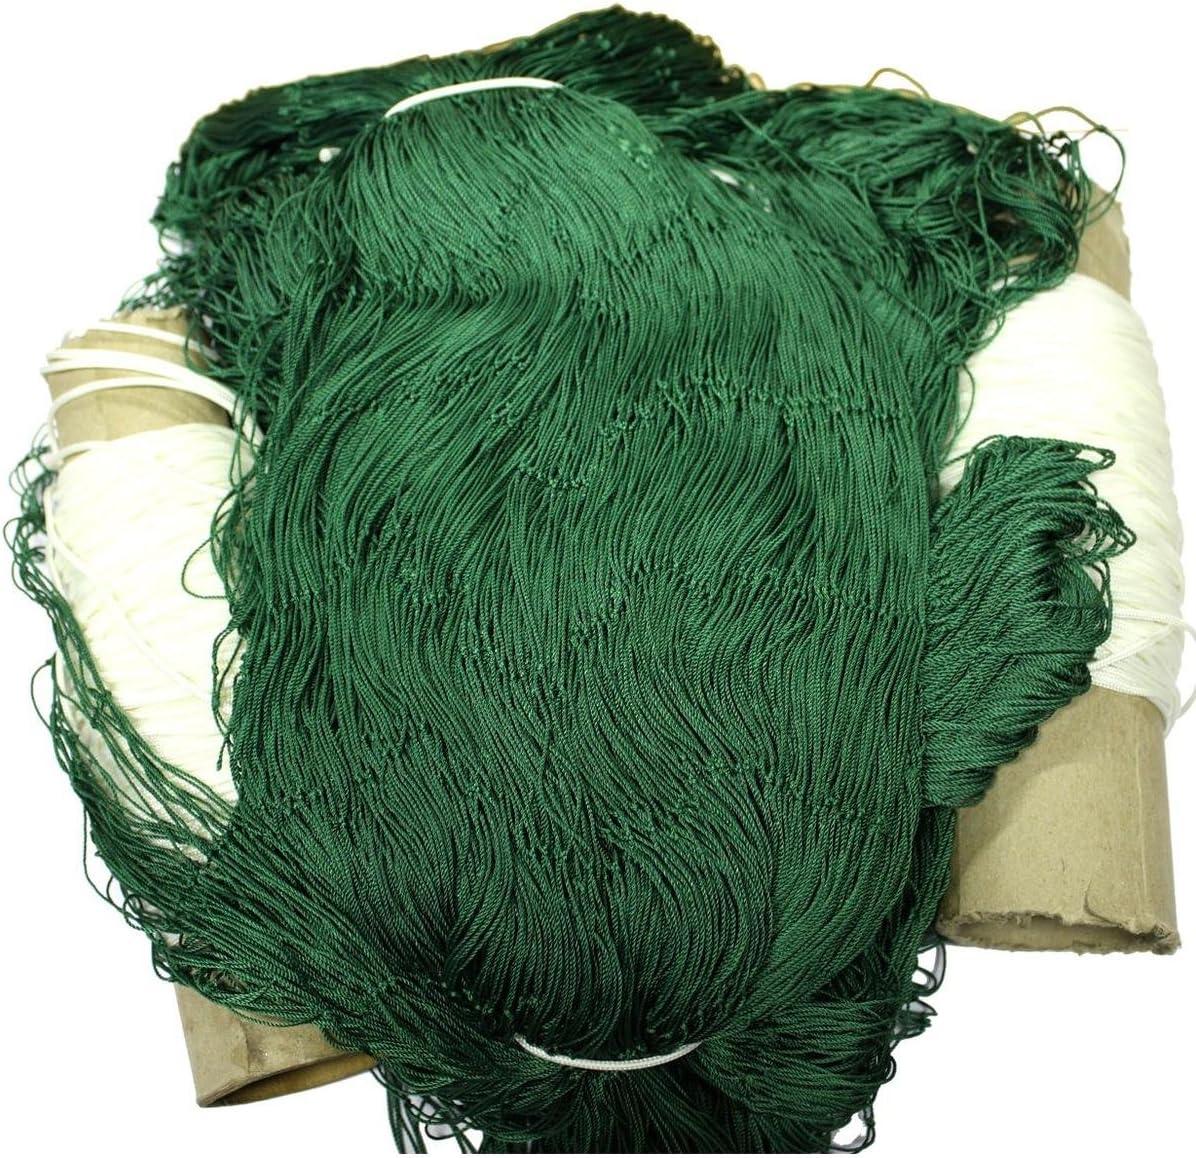 Bisley Long Net 100yd